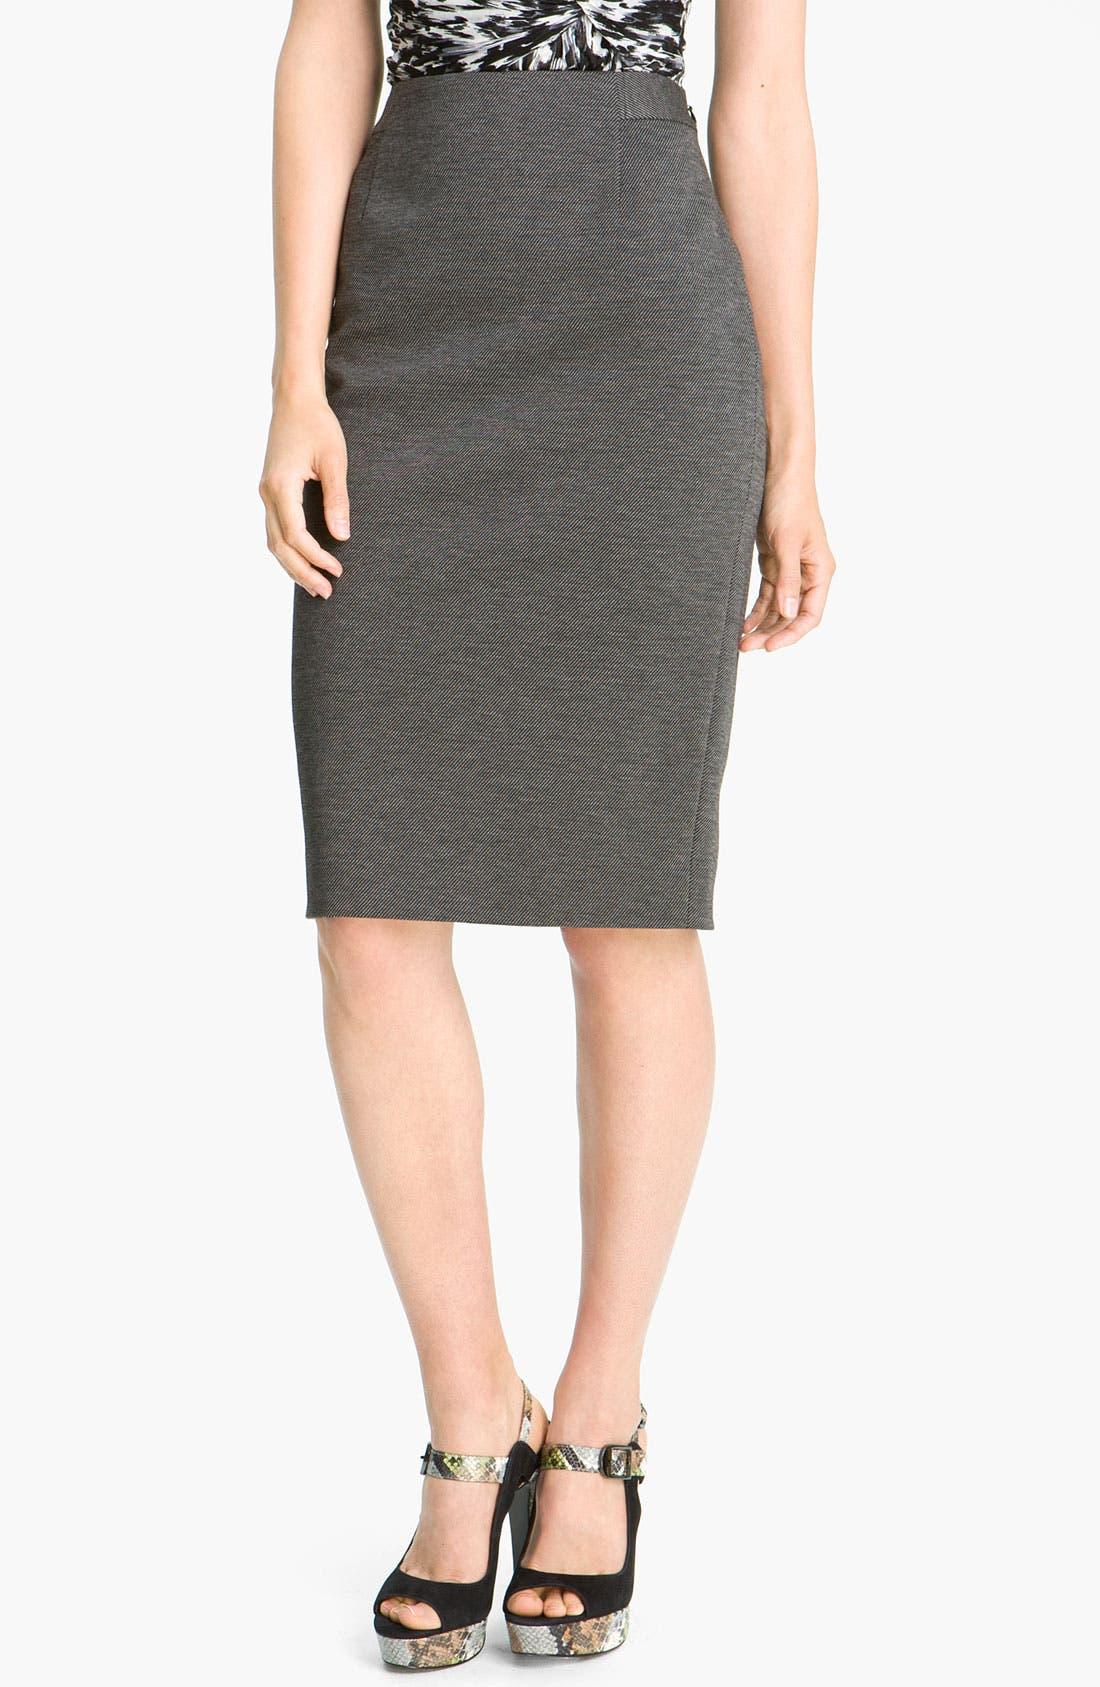 Alternate Image 1 Selected - Classiques Entier® 'Duomo' Knit Pencil Skirt